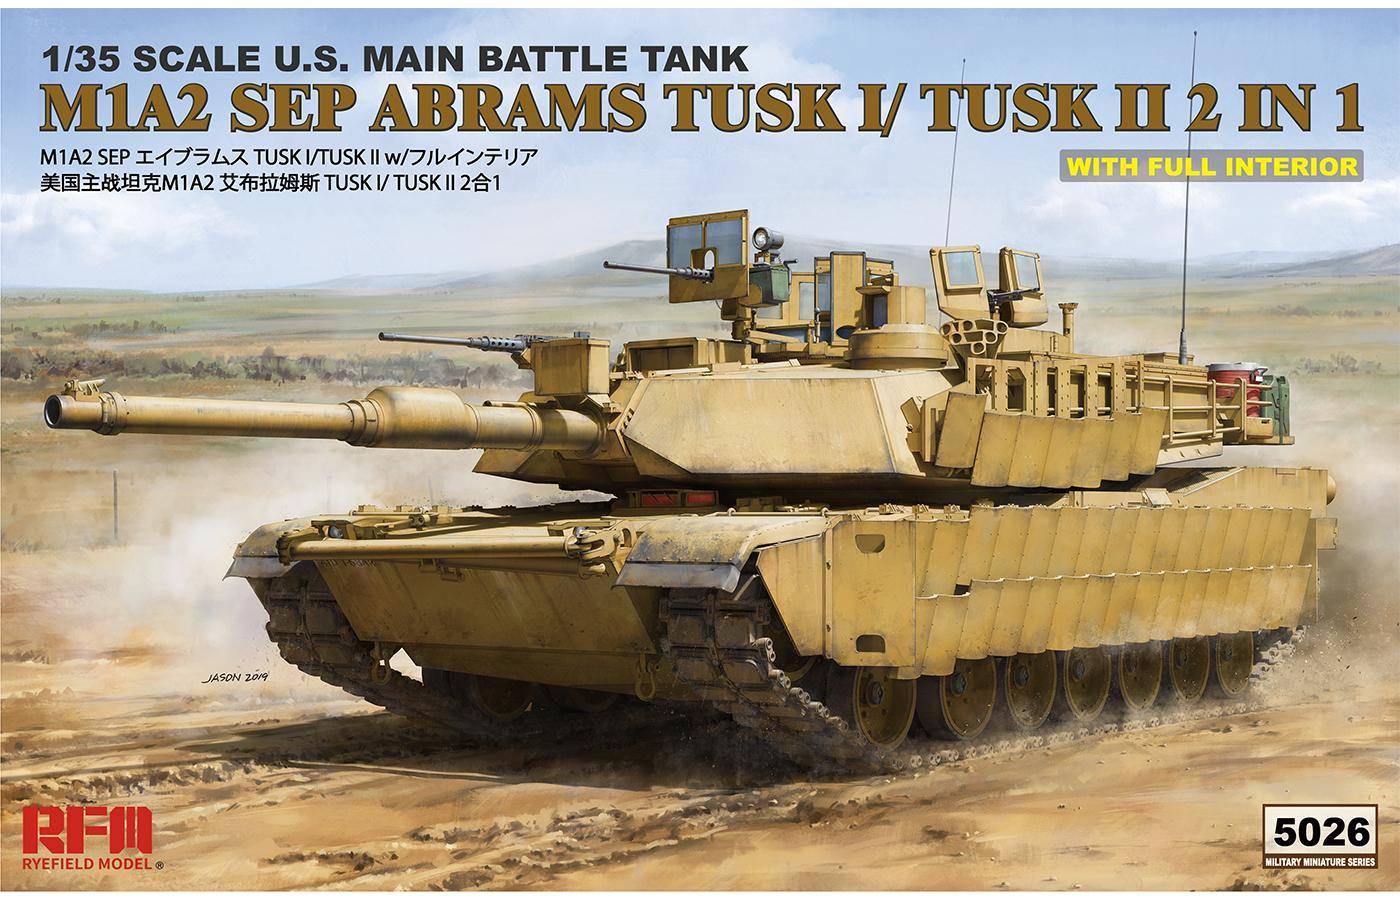 RM-5026 M1A2 SEP ABRAMS TUSK I/TUSK II  2 IN 1